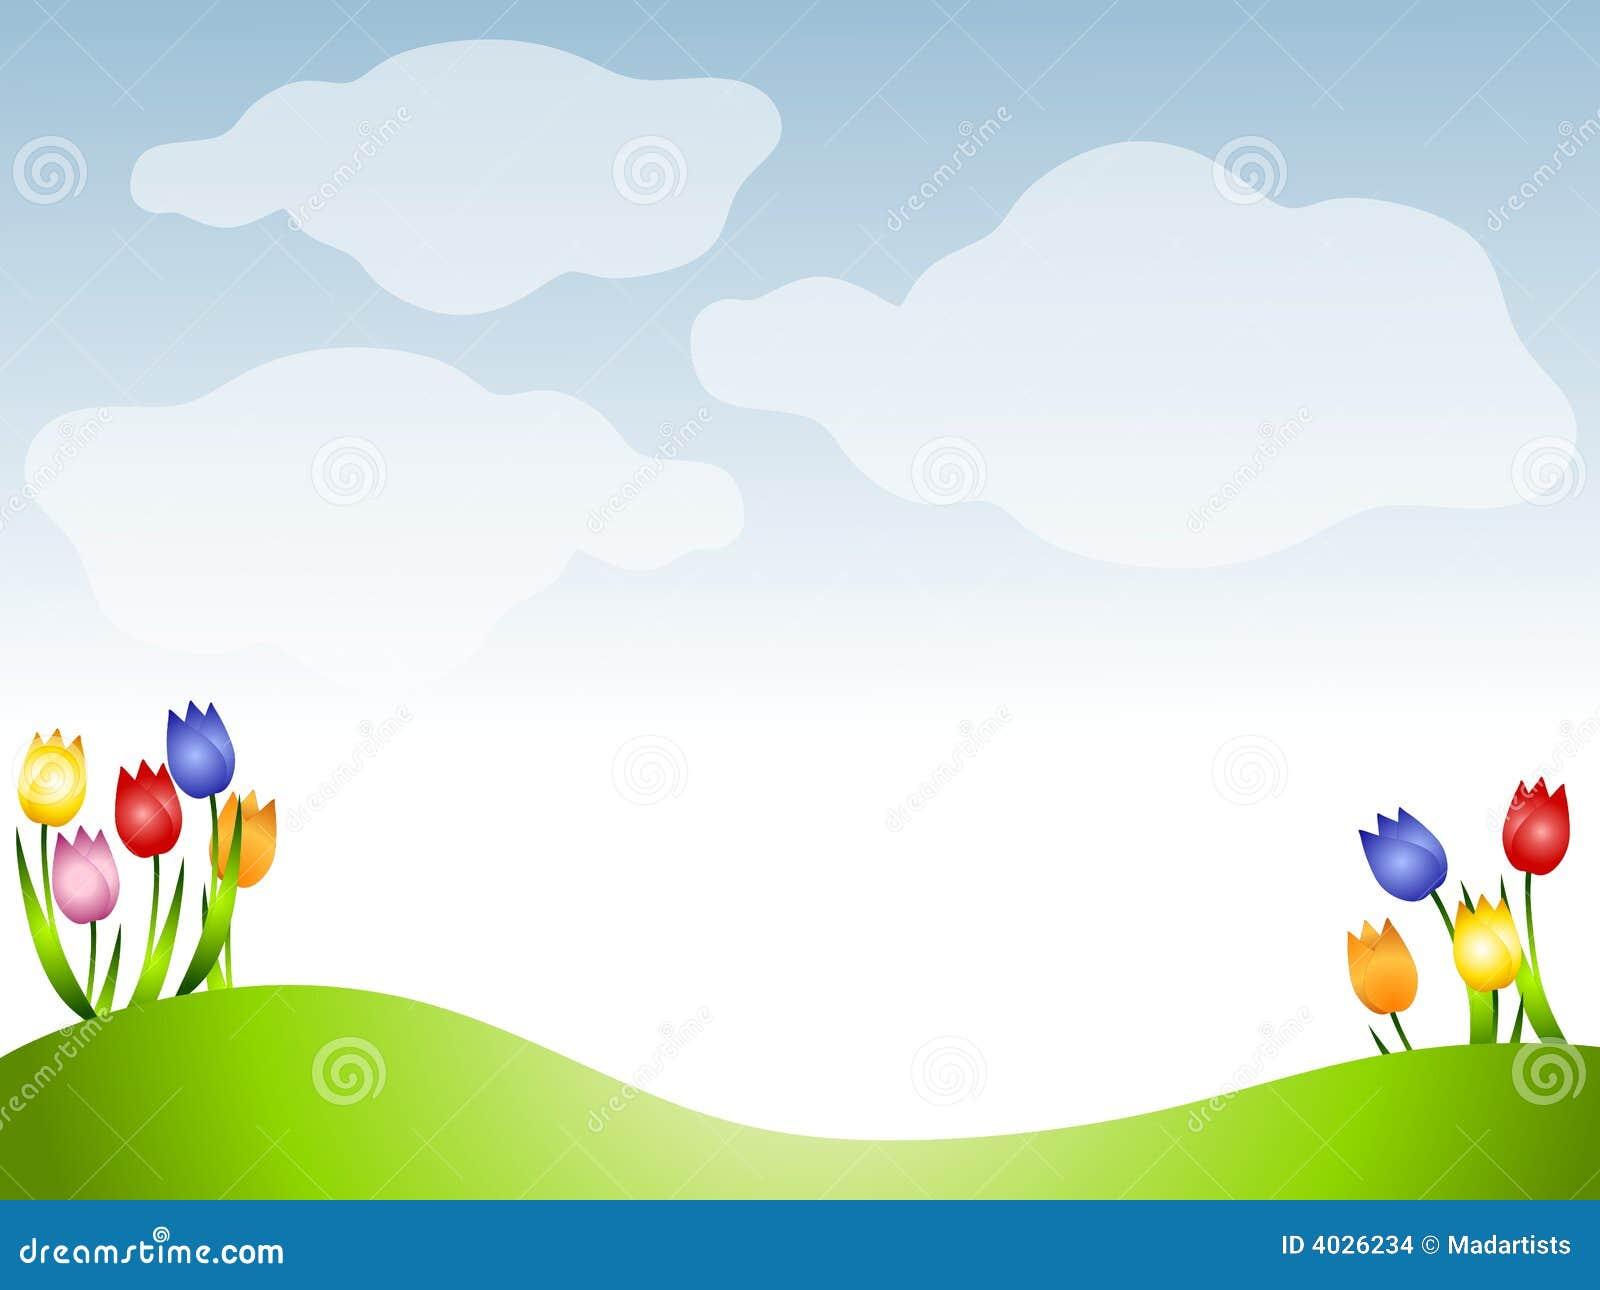 Natural Images Background